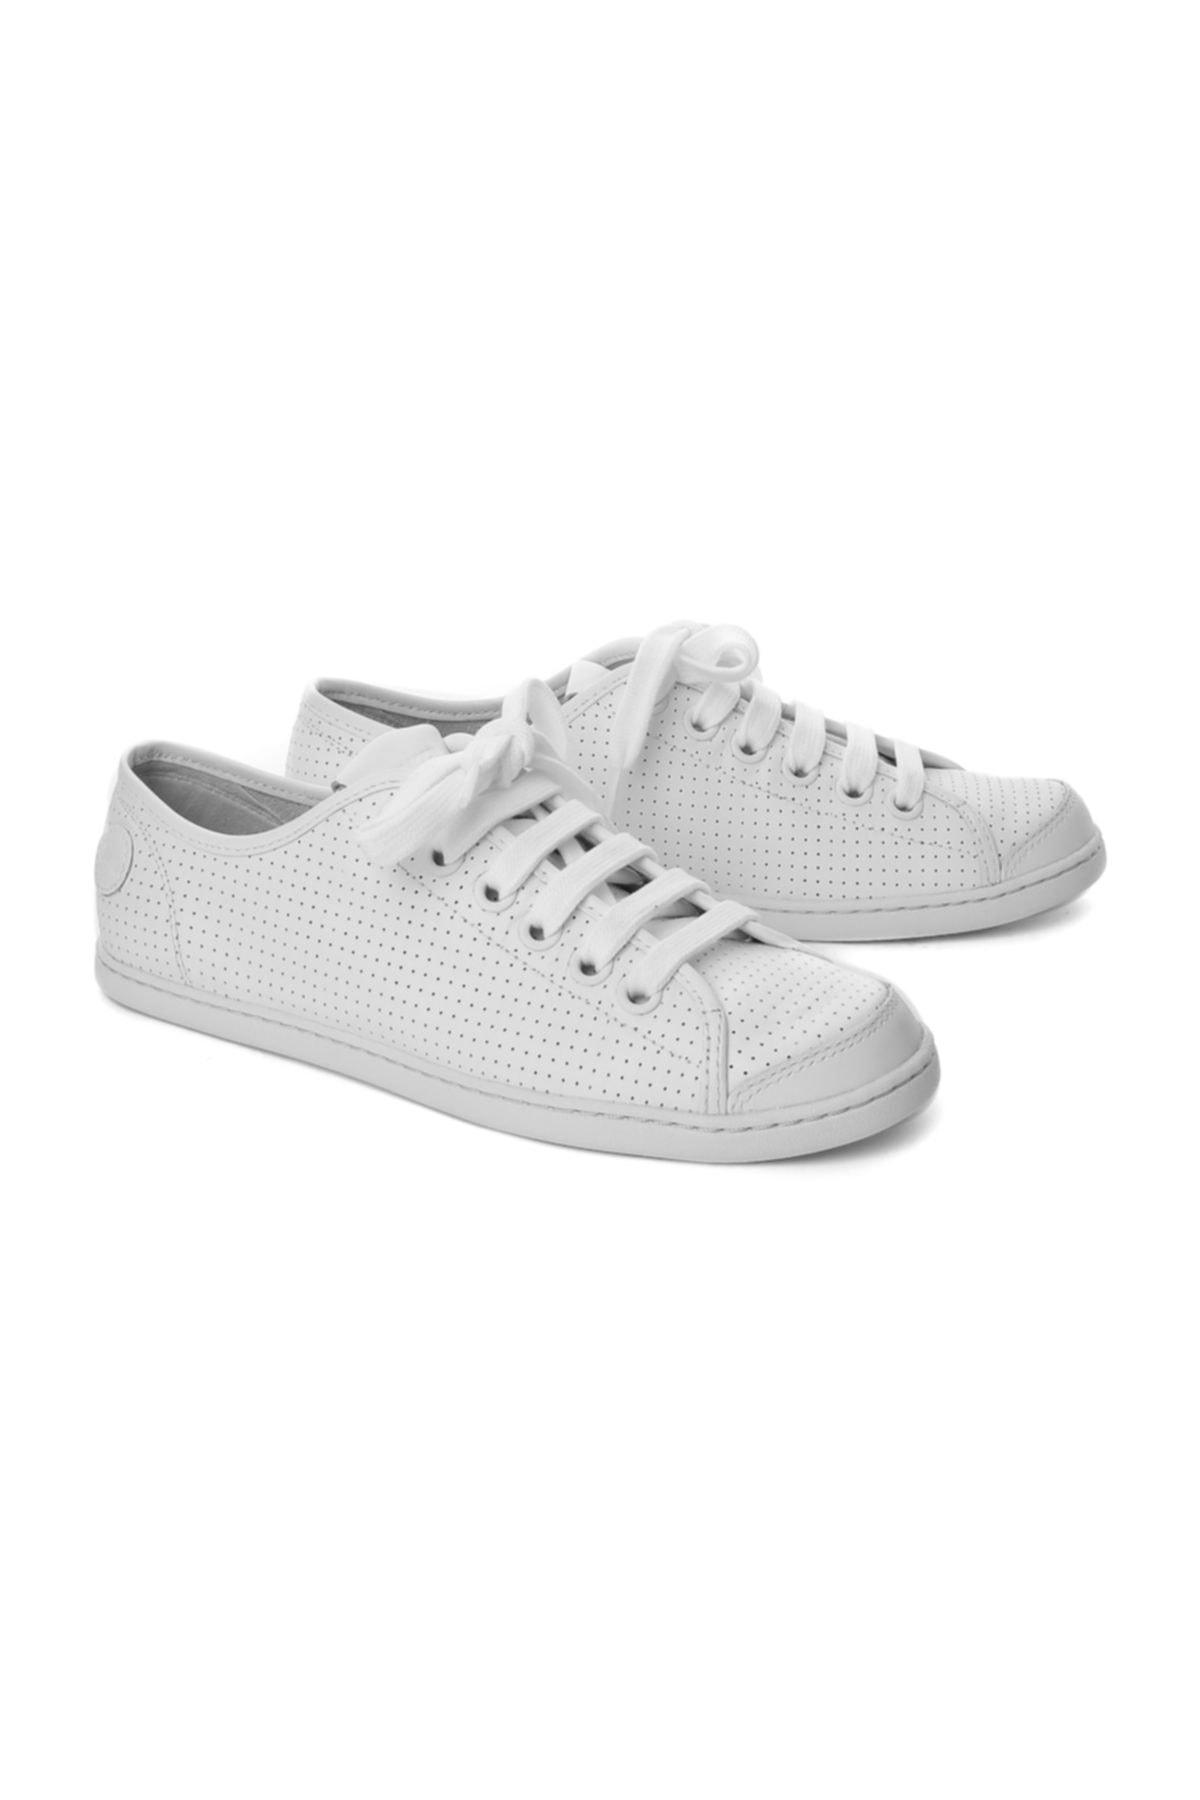 CAMPER Kadın  Sneaker 21815-046 2